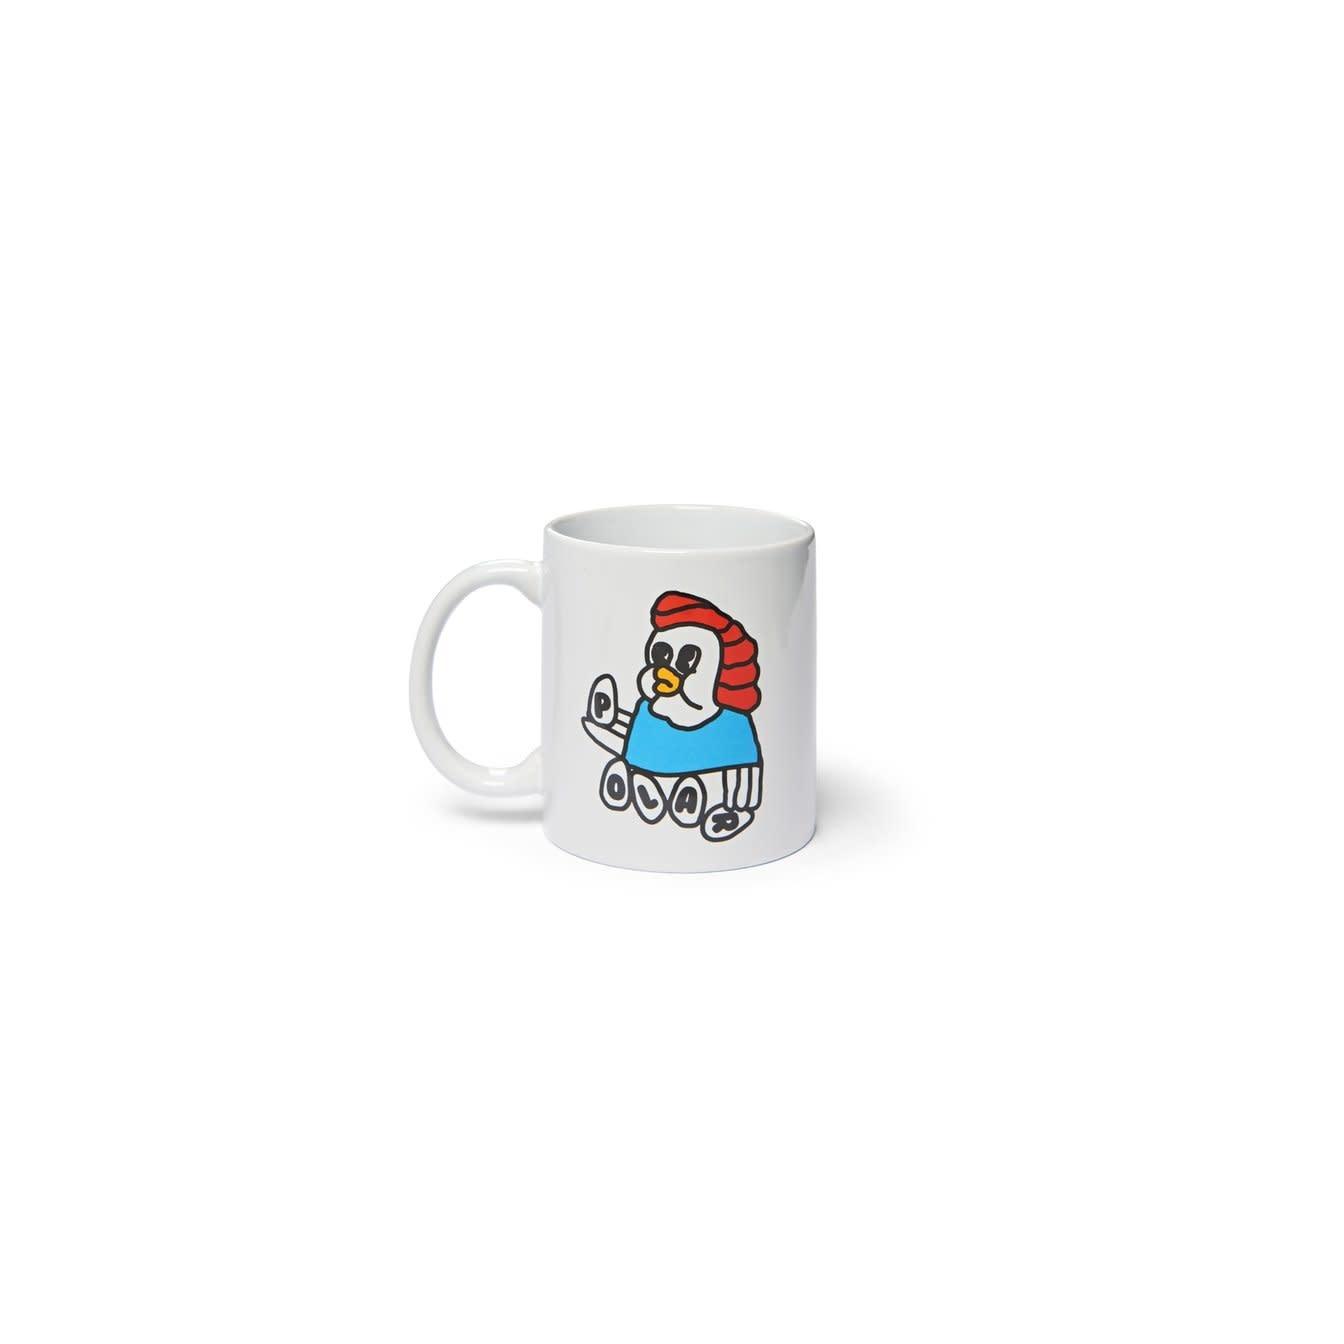 Polar Skate Co. Chicken Mama Mug